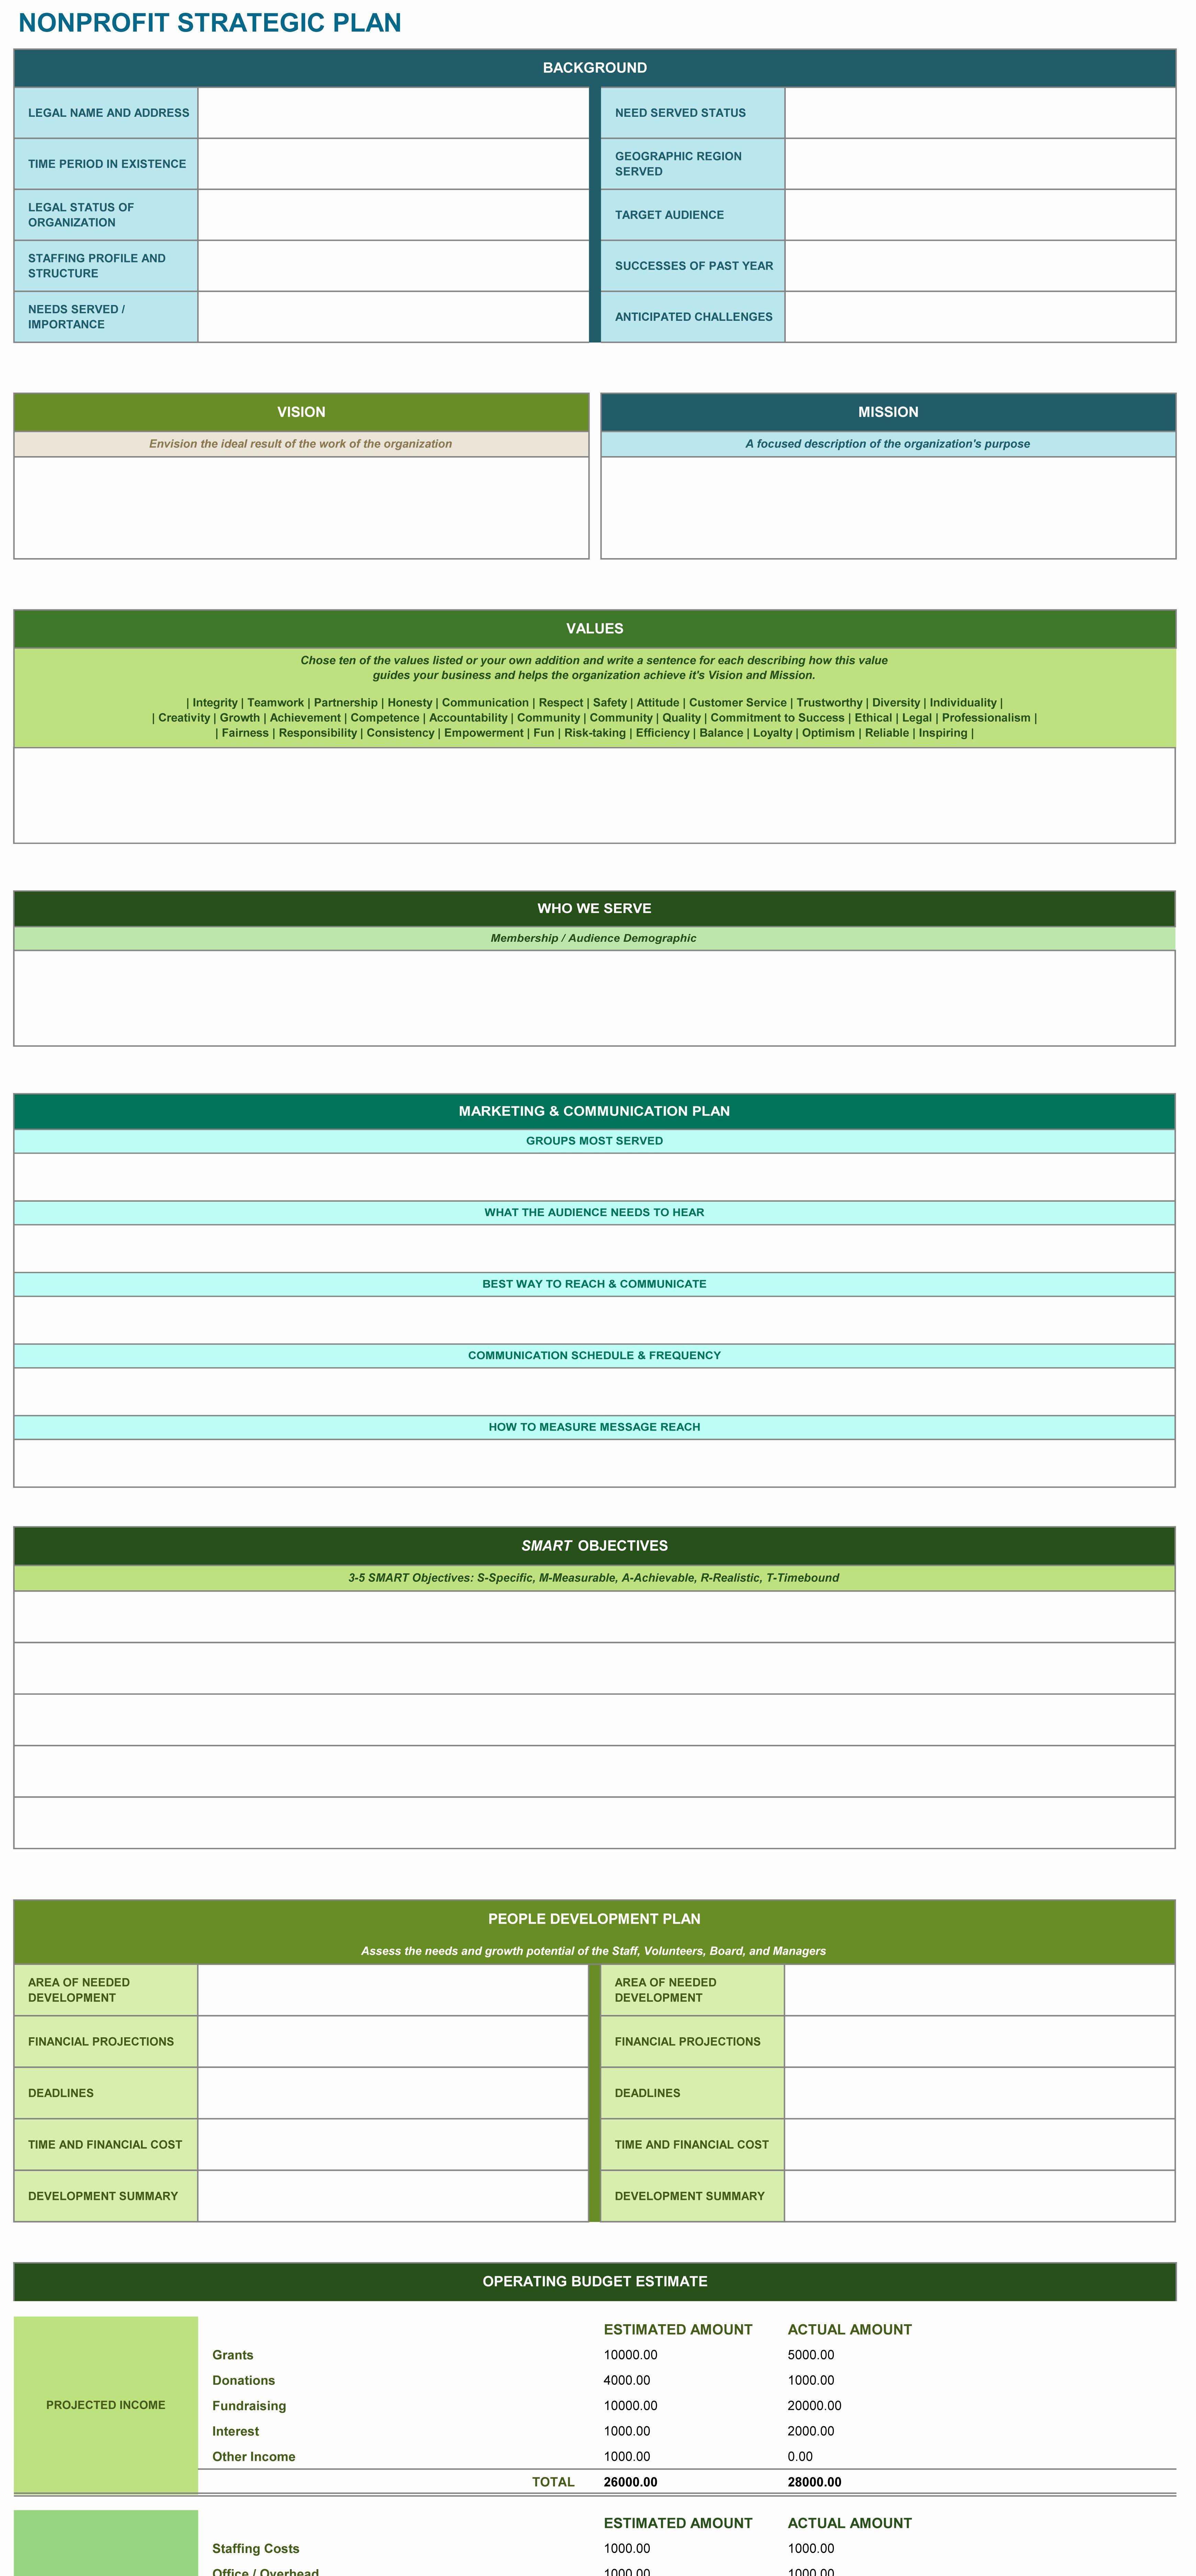 Strategic Plan Template Nonprofit Elegant 9 Free Strategic Planning Templates Smartsheet